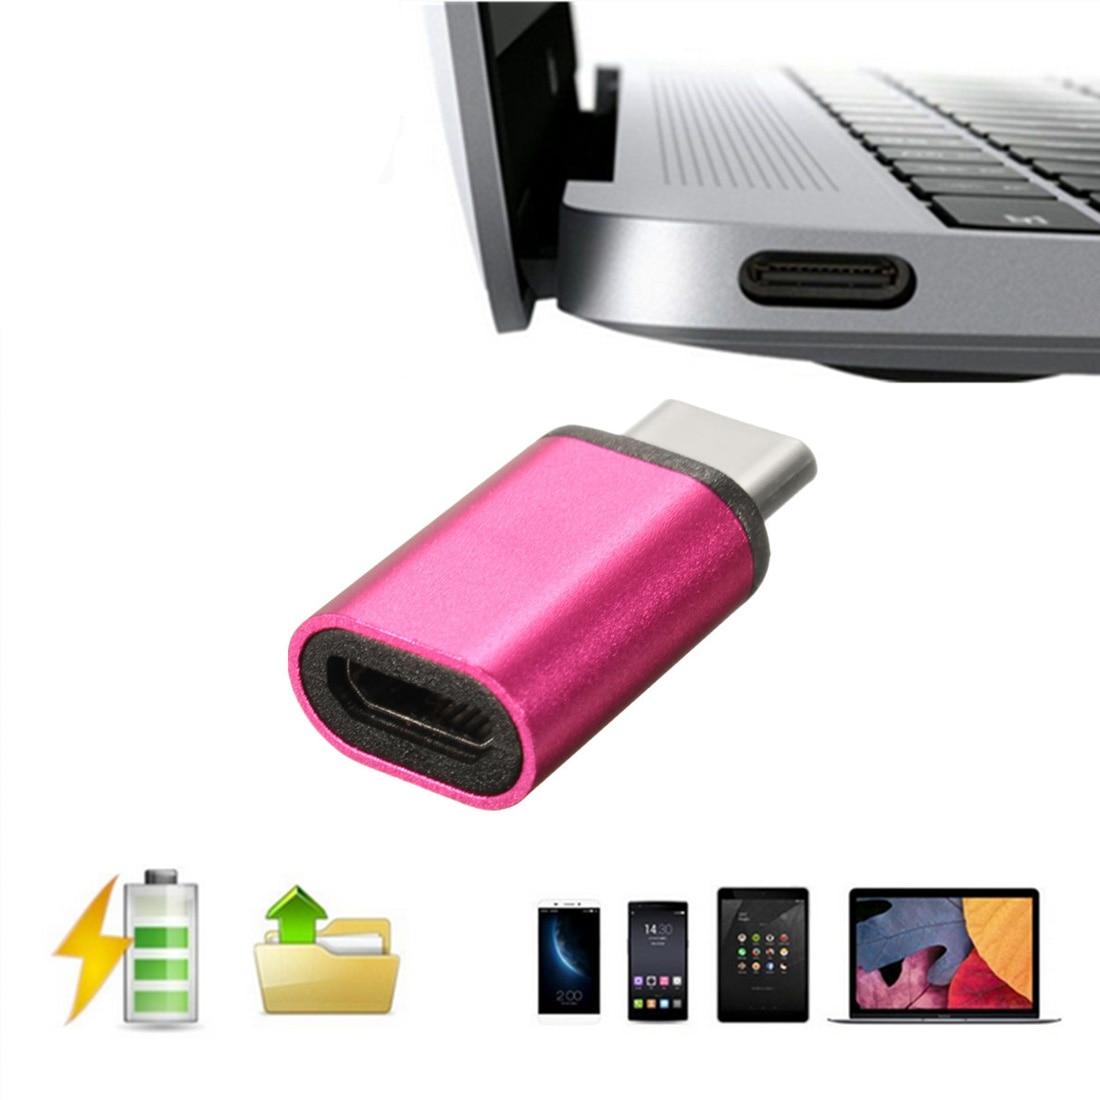 Etmakit USB Type C Male Connector to Micro USB Female Converter USB-C Type-C Adapter for OnePlus 2 Nexus 5X 6P